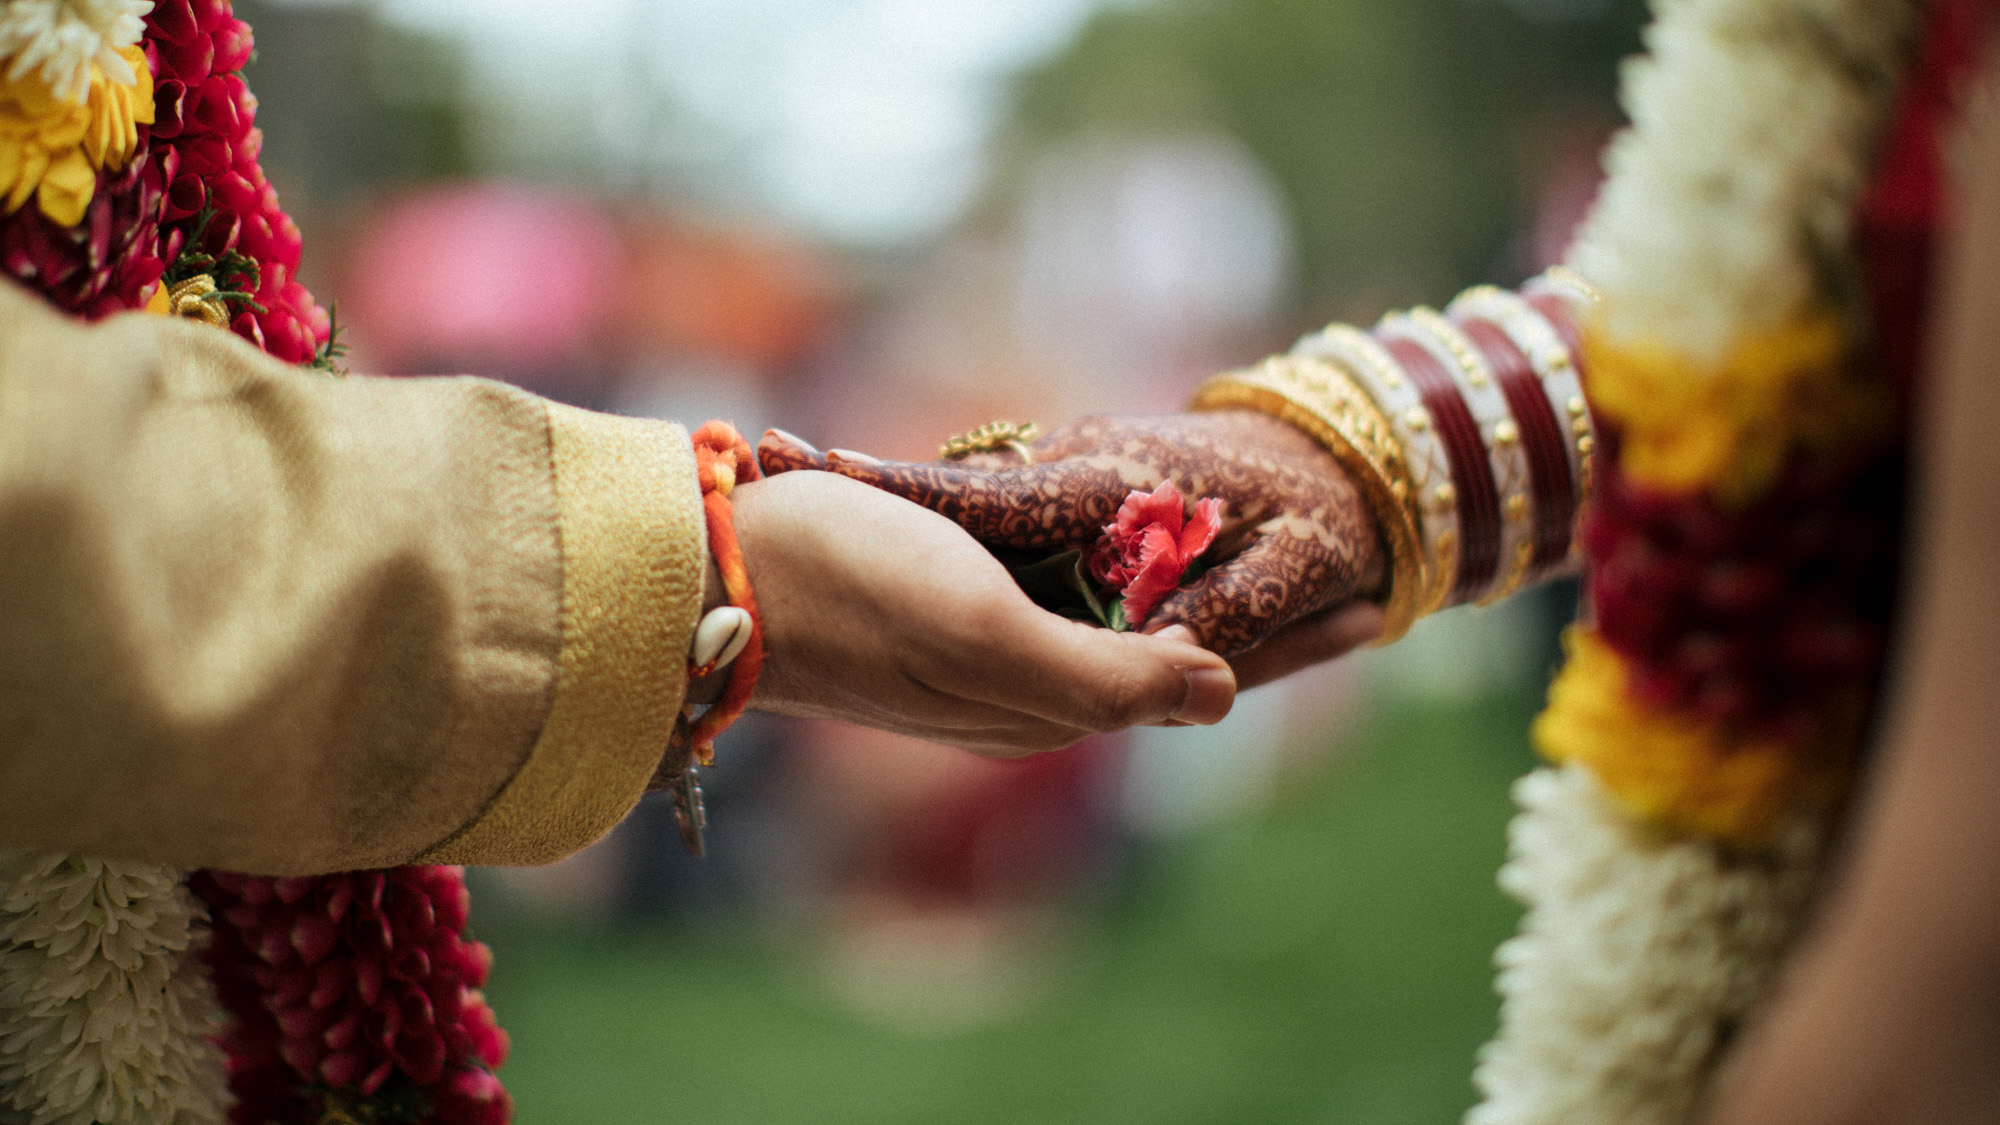 anu_maneesh_alec_vanderboom_Indian_wedding_photography-0107.jpg